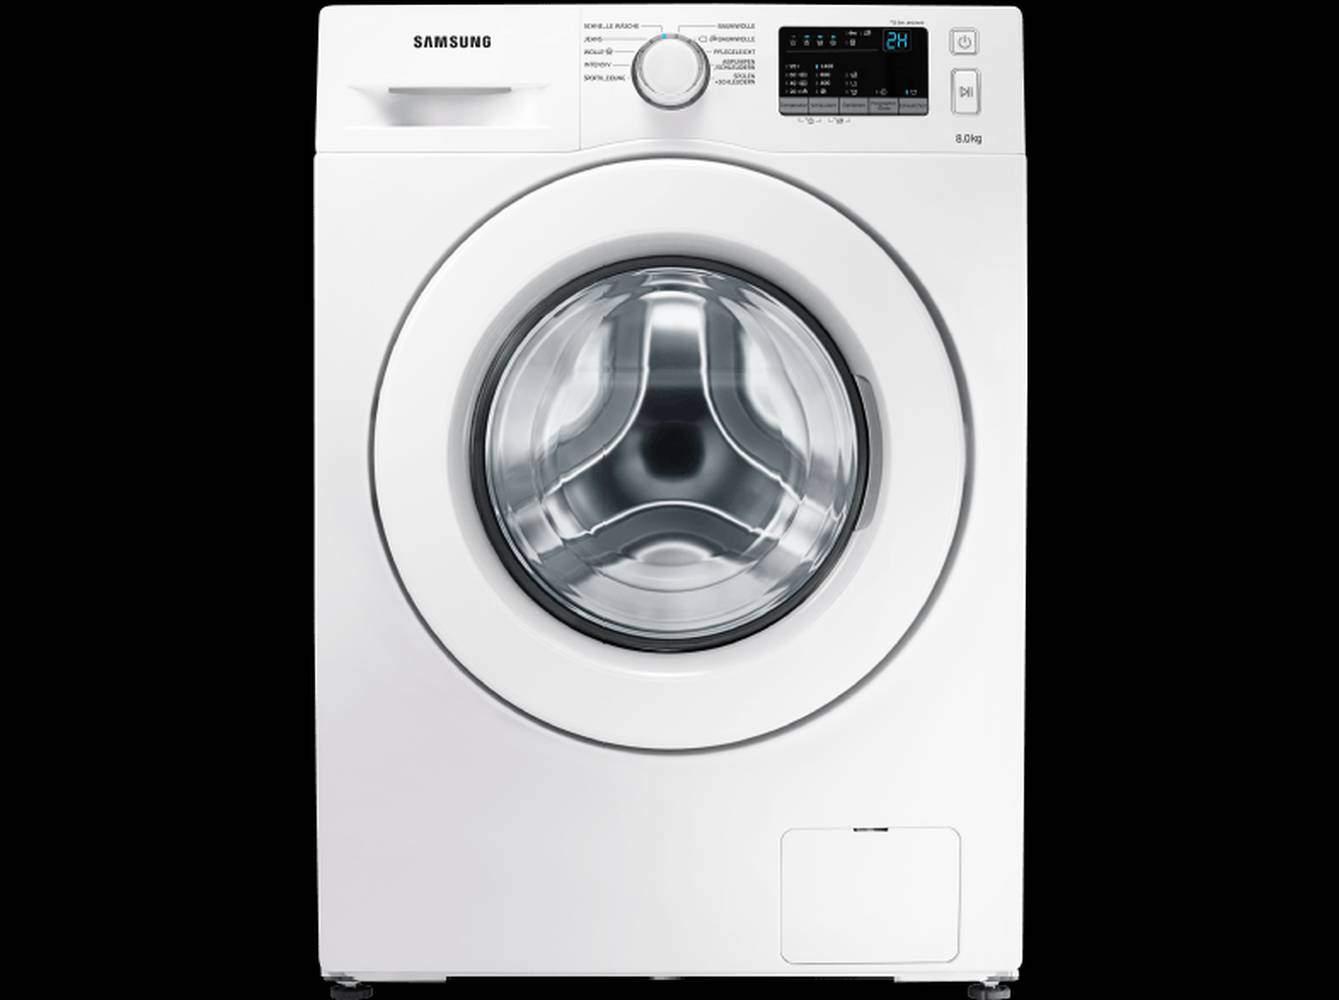 Unterbausockel für waschtrockner waschtrockner ratgeber